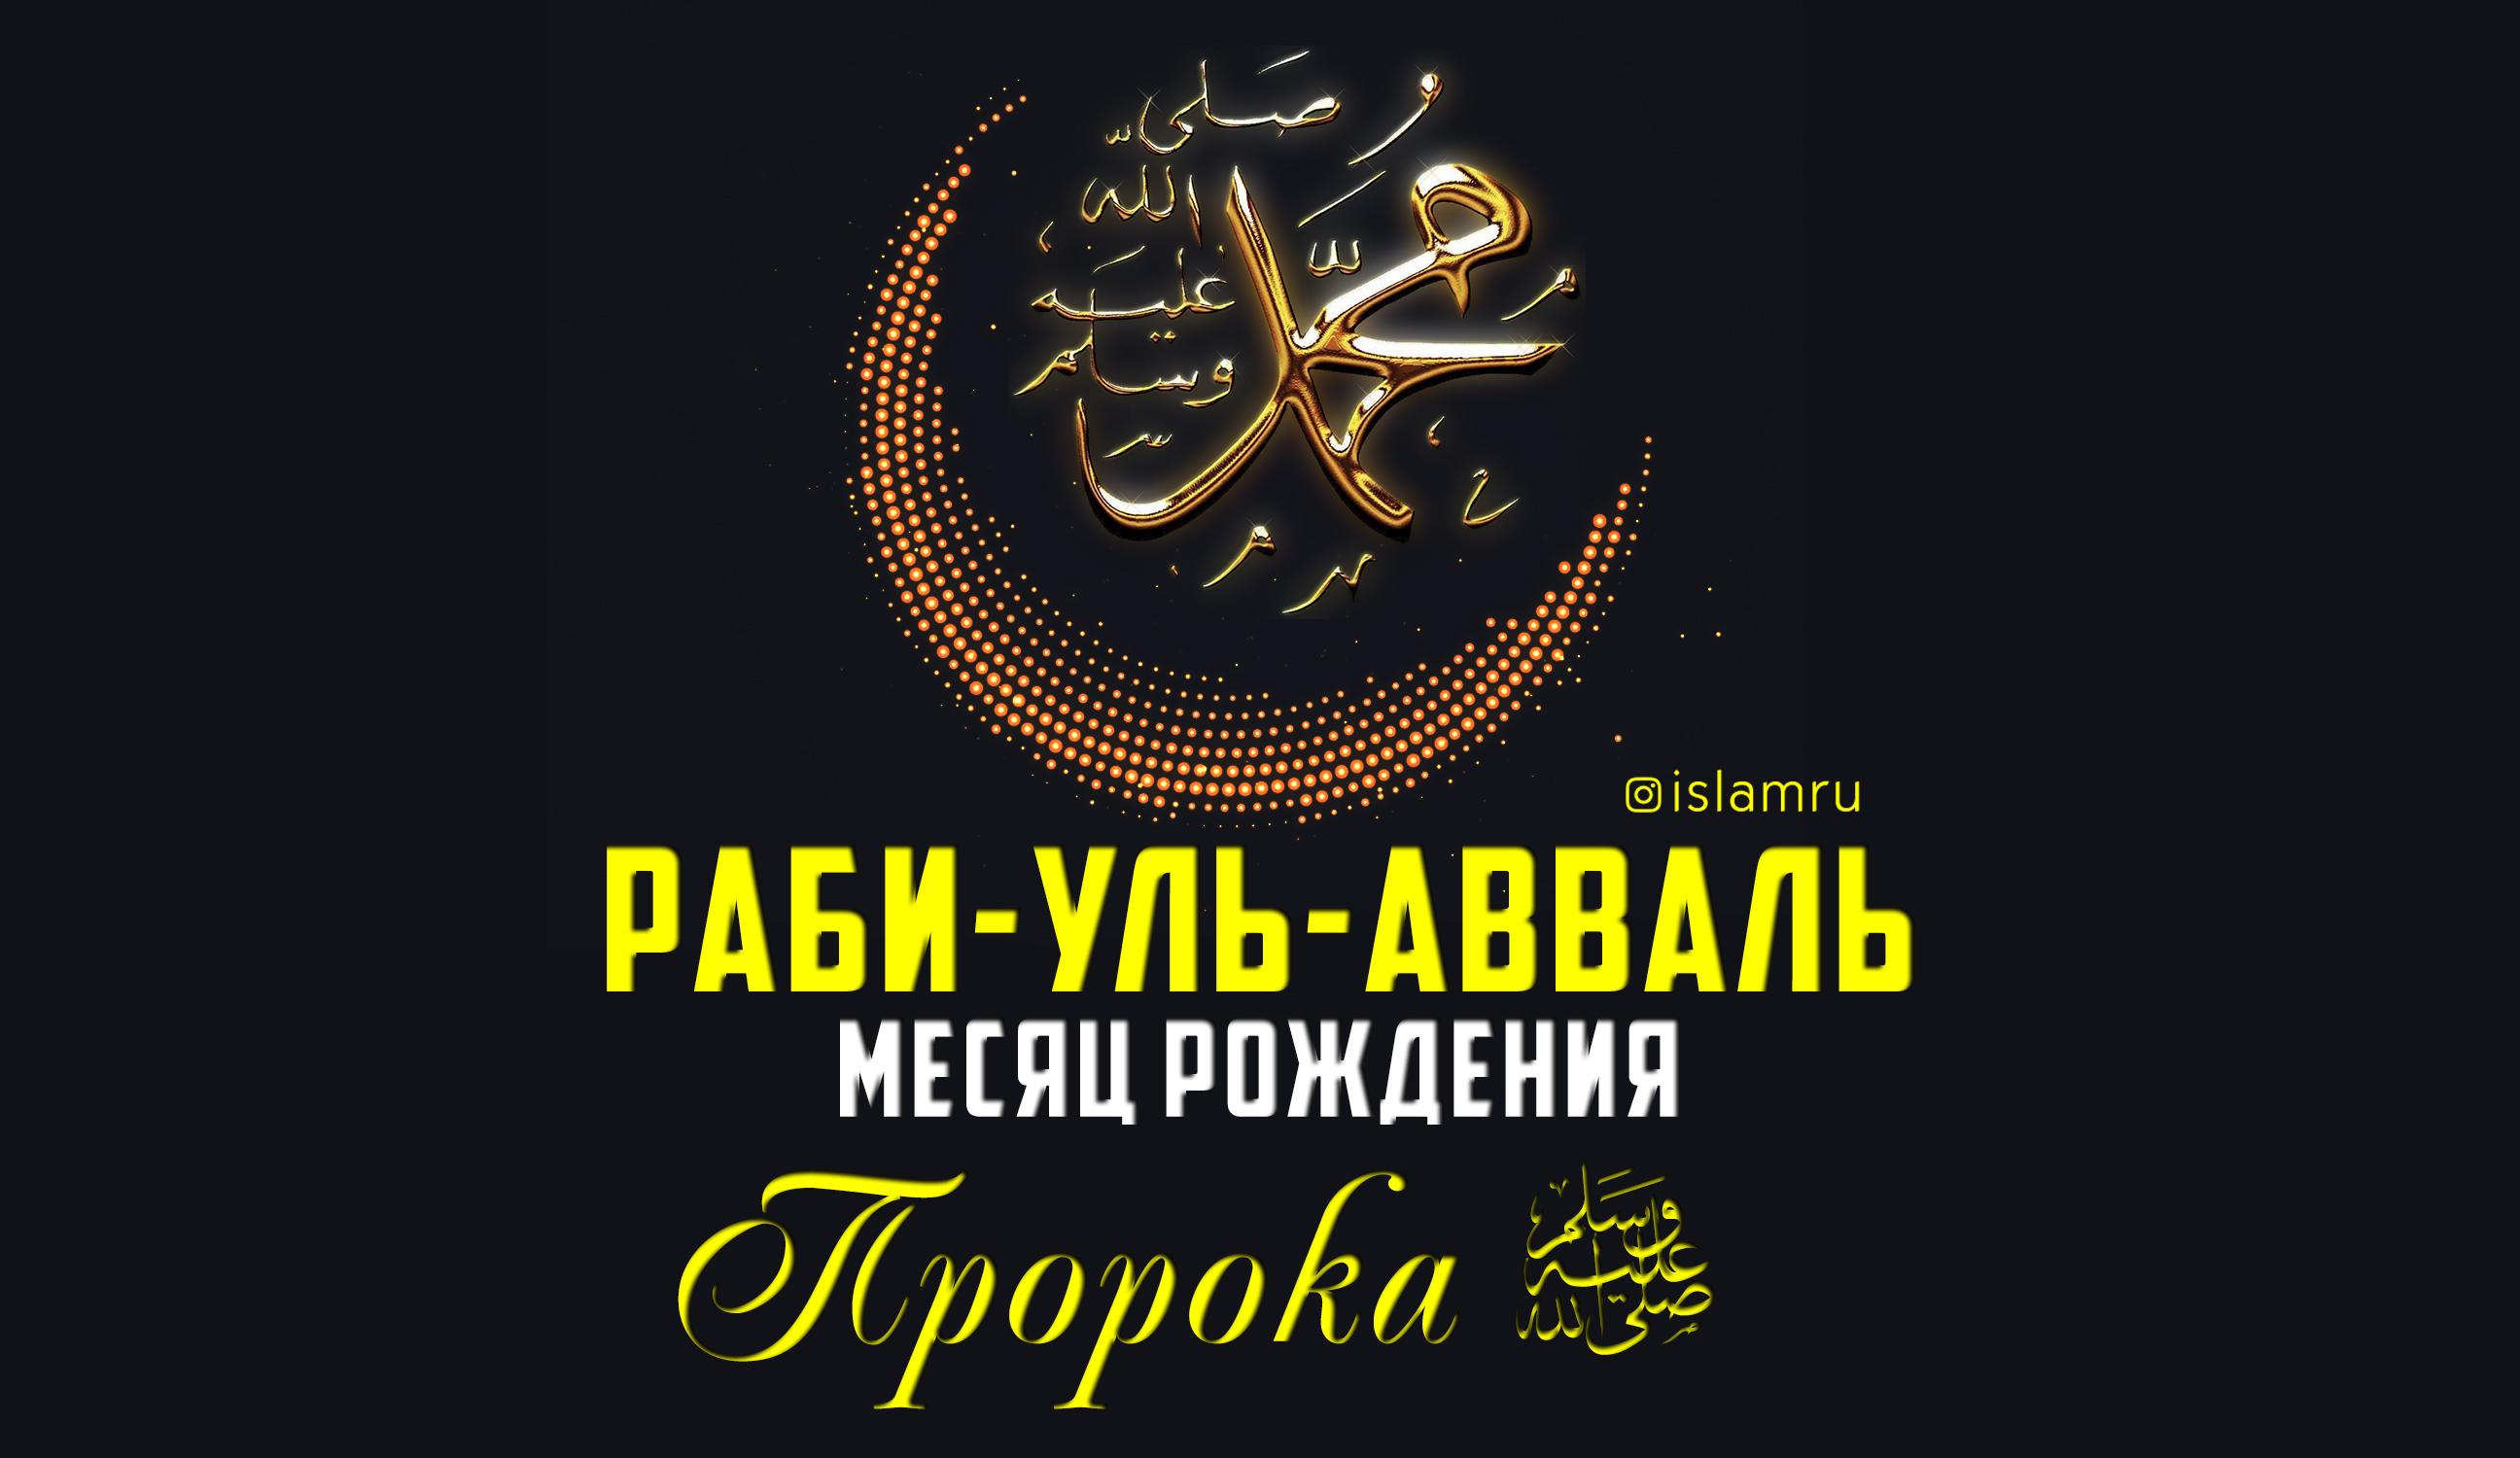 pozdravlyaem-s-rabi-ul-avval